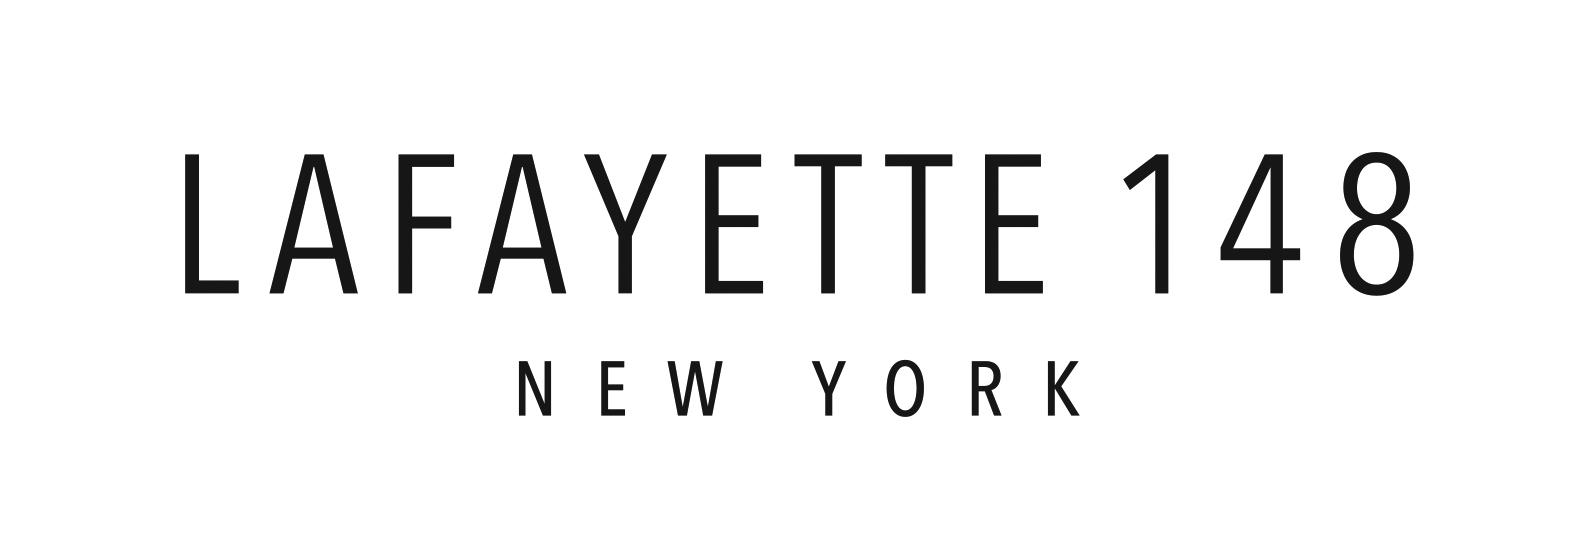 Lafayette 148 NY